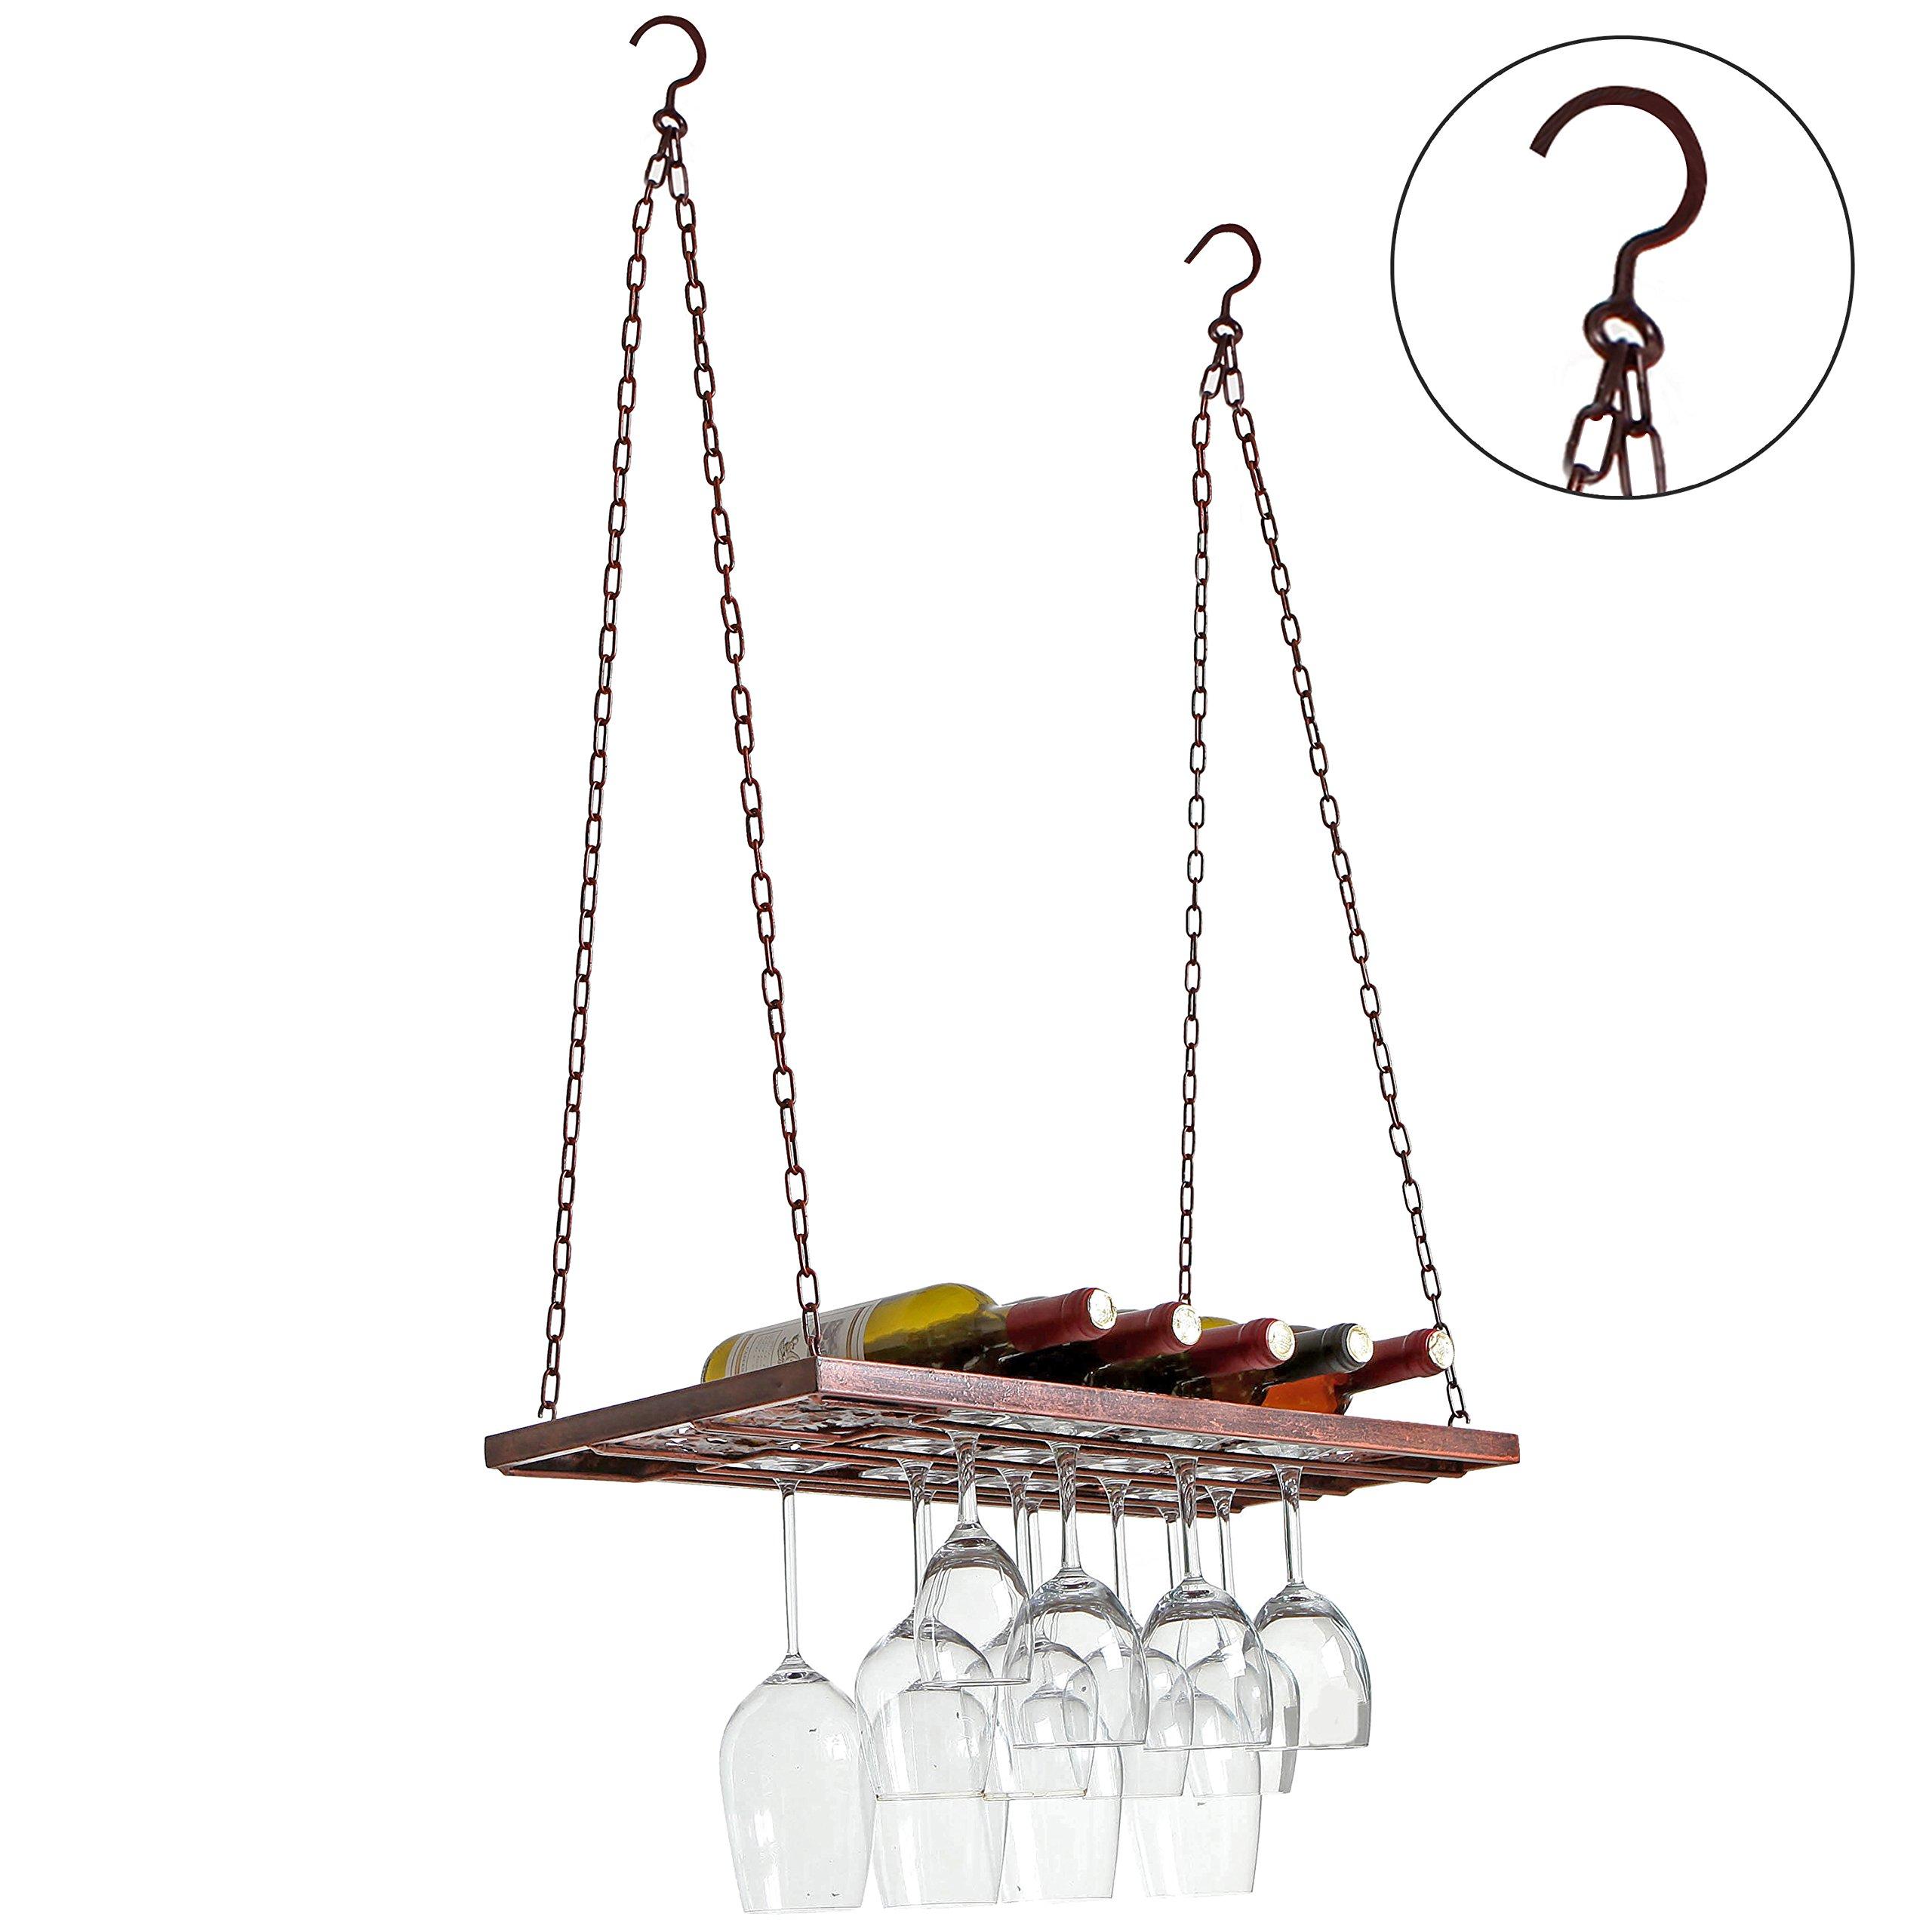 Vineyard Country Rustic Bronze Metal Ceiling Mounted Hanging Stemware Wine Glass Hanger Organizer Rack by MyGift (Image #1)